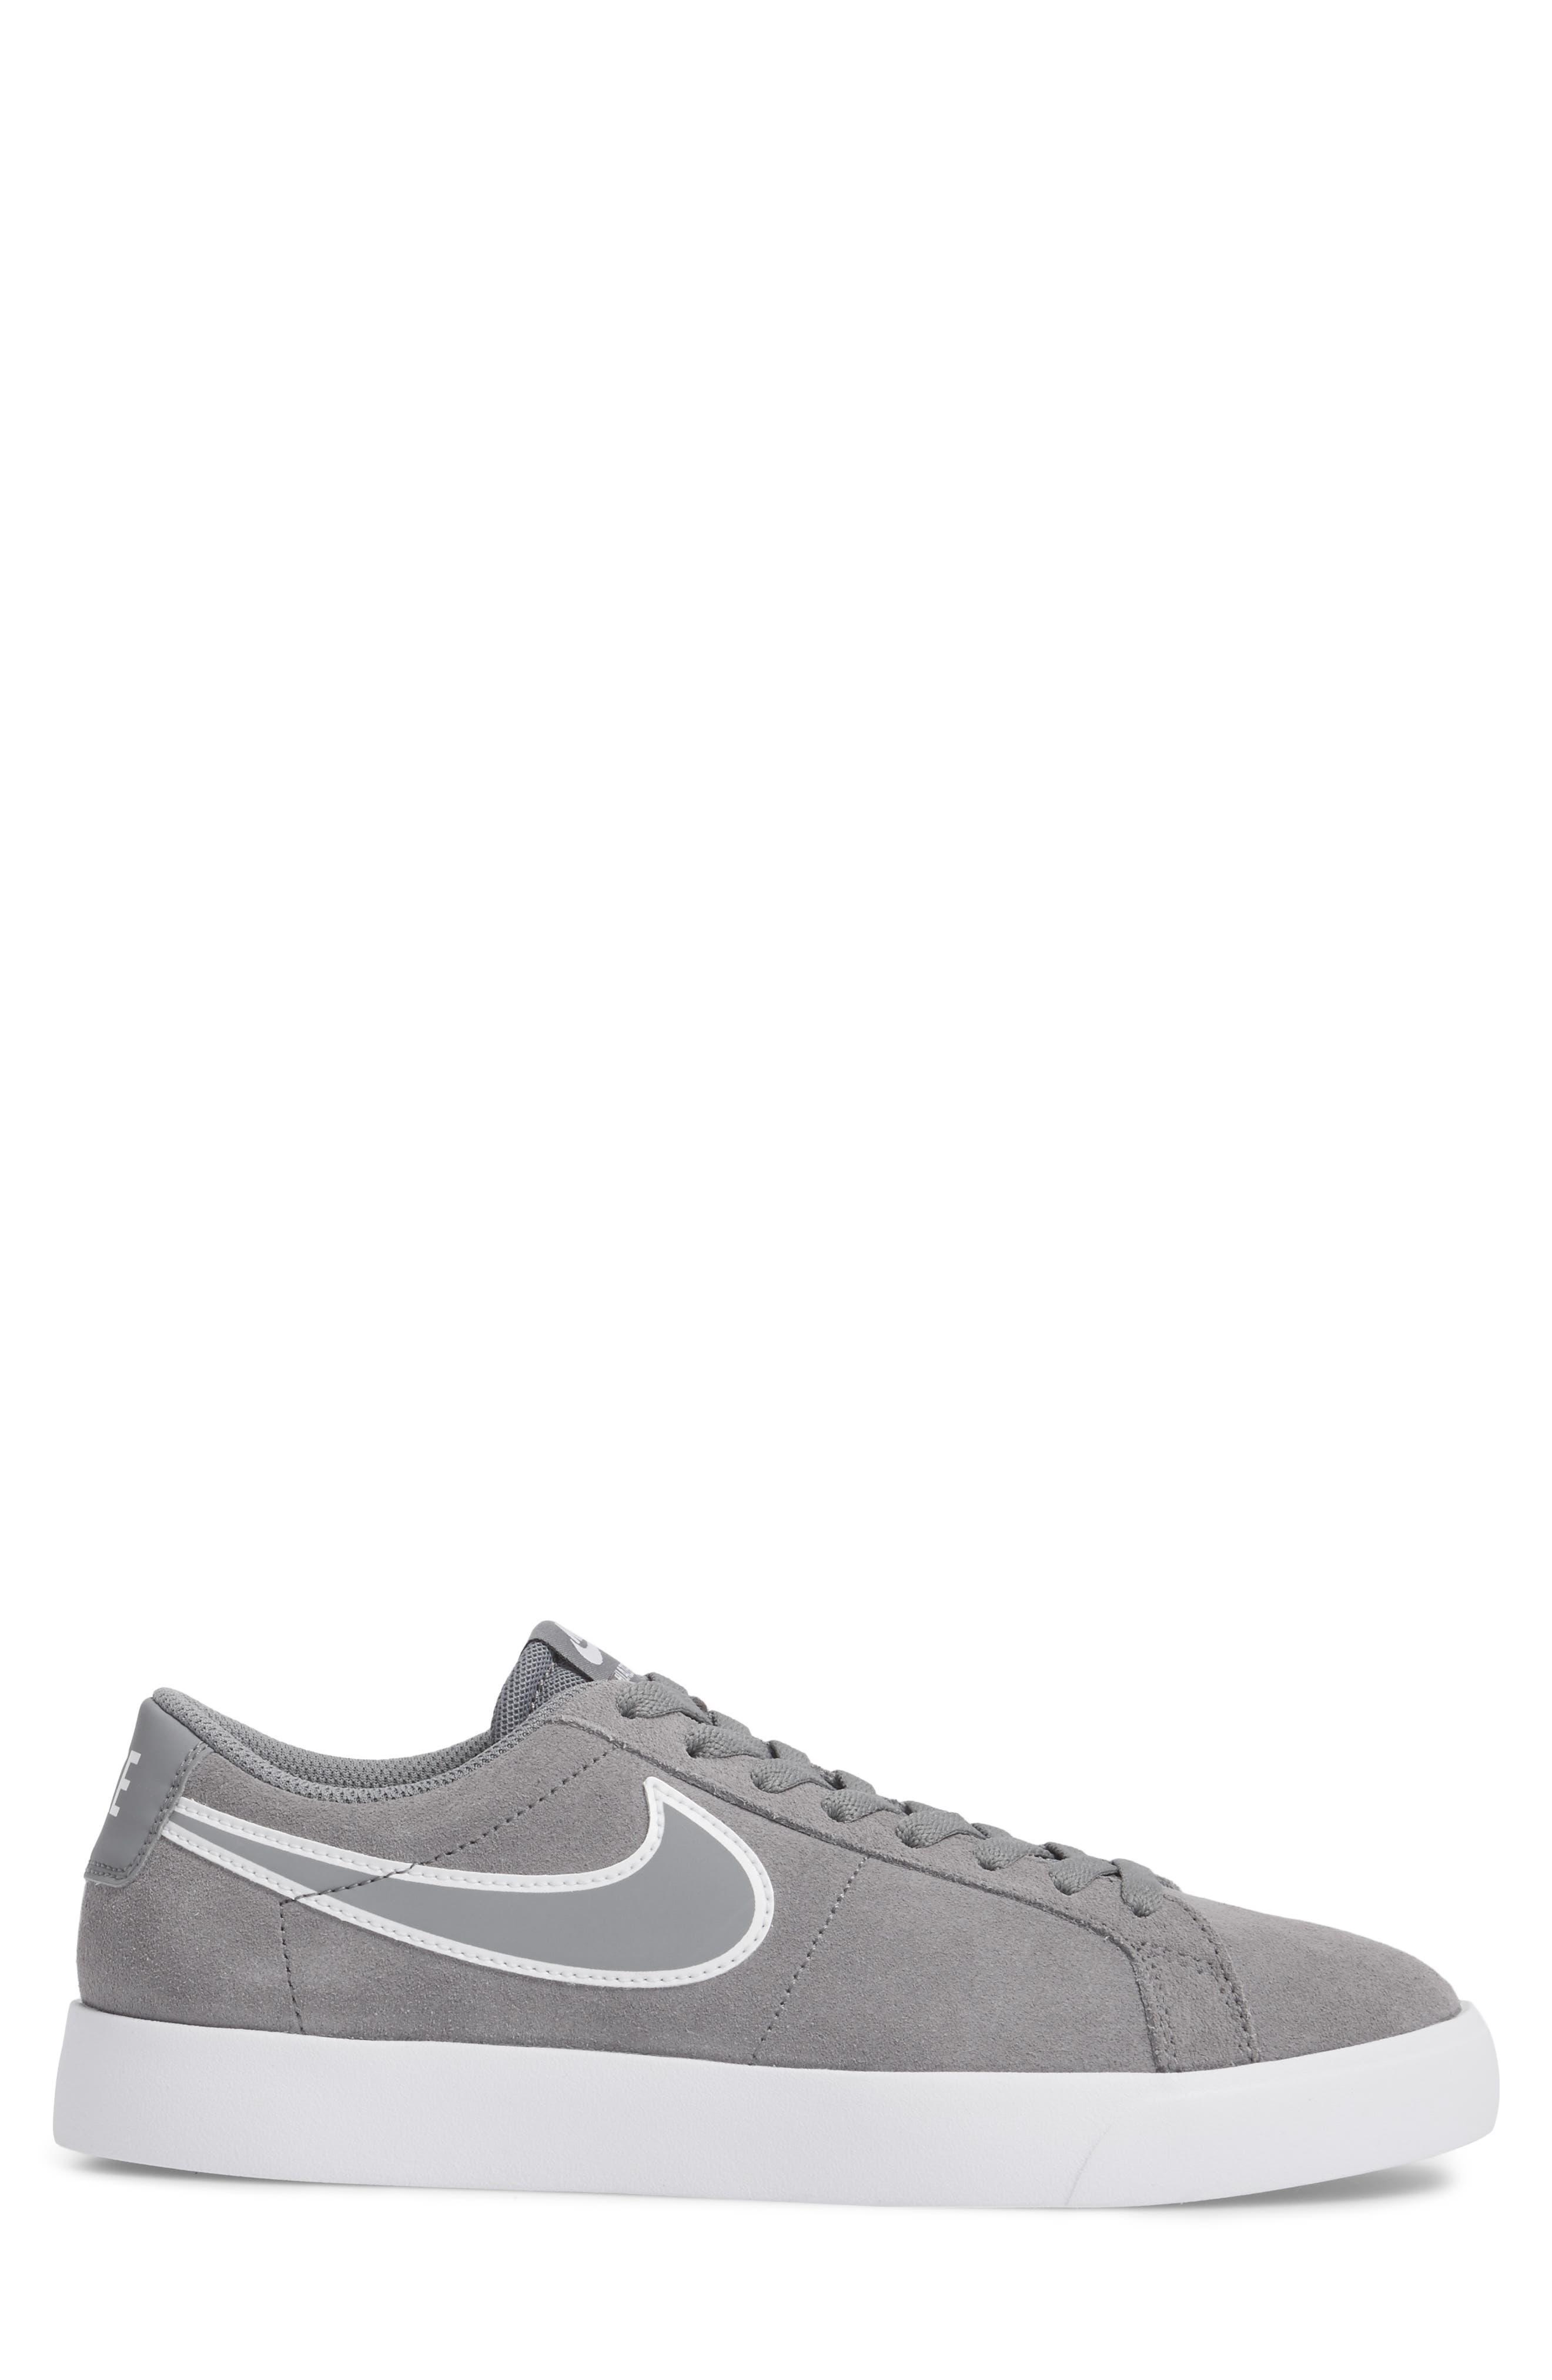 SB Blazer Vapor Skateboarding Sneaker,                             Alternate thumbnail 3, color,                             Cool Grey/Cool Grey/White